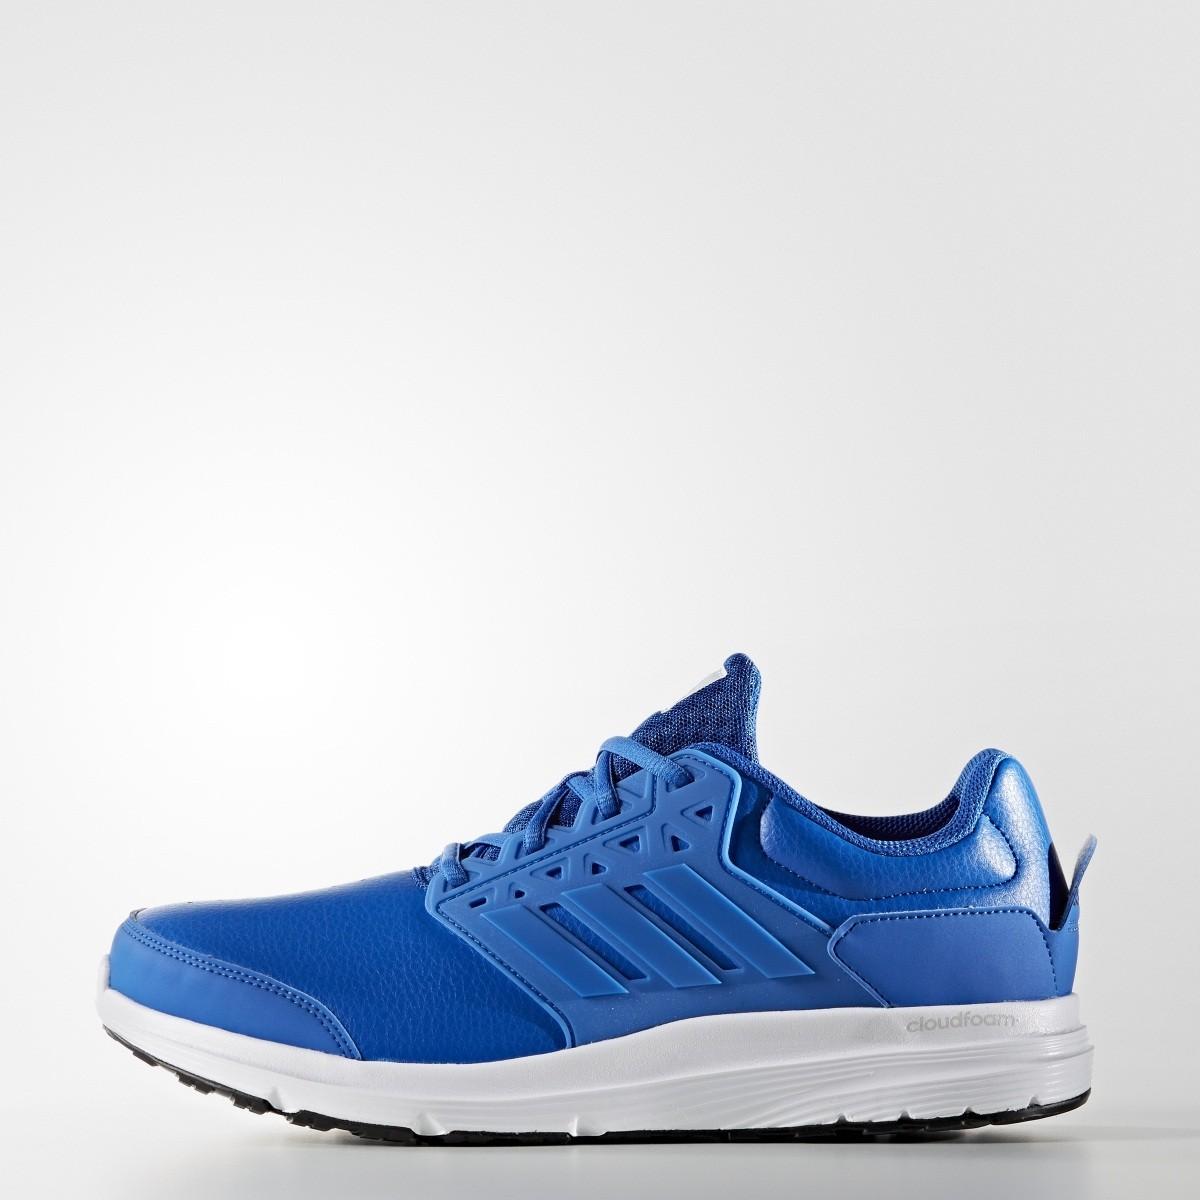 09dc272a2d3 Pánské fitness boty adidas galaxy 3 trainer